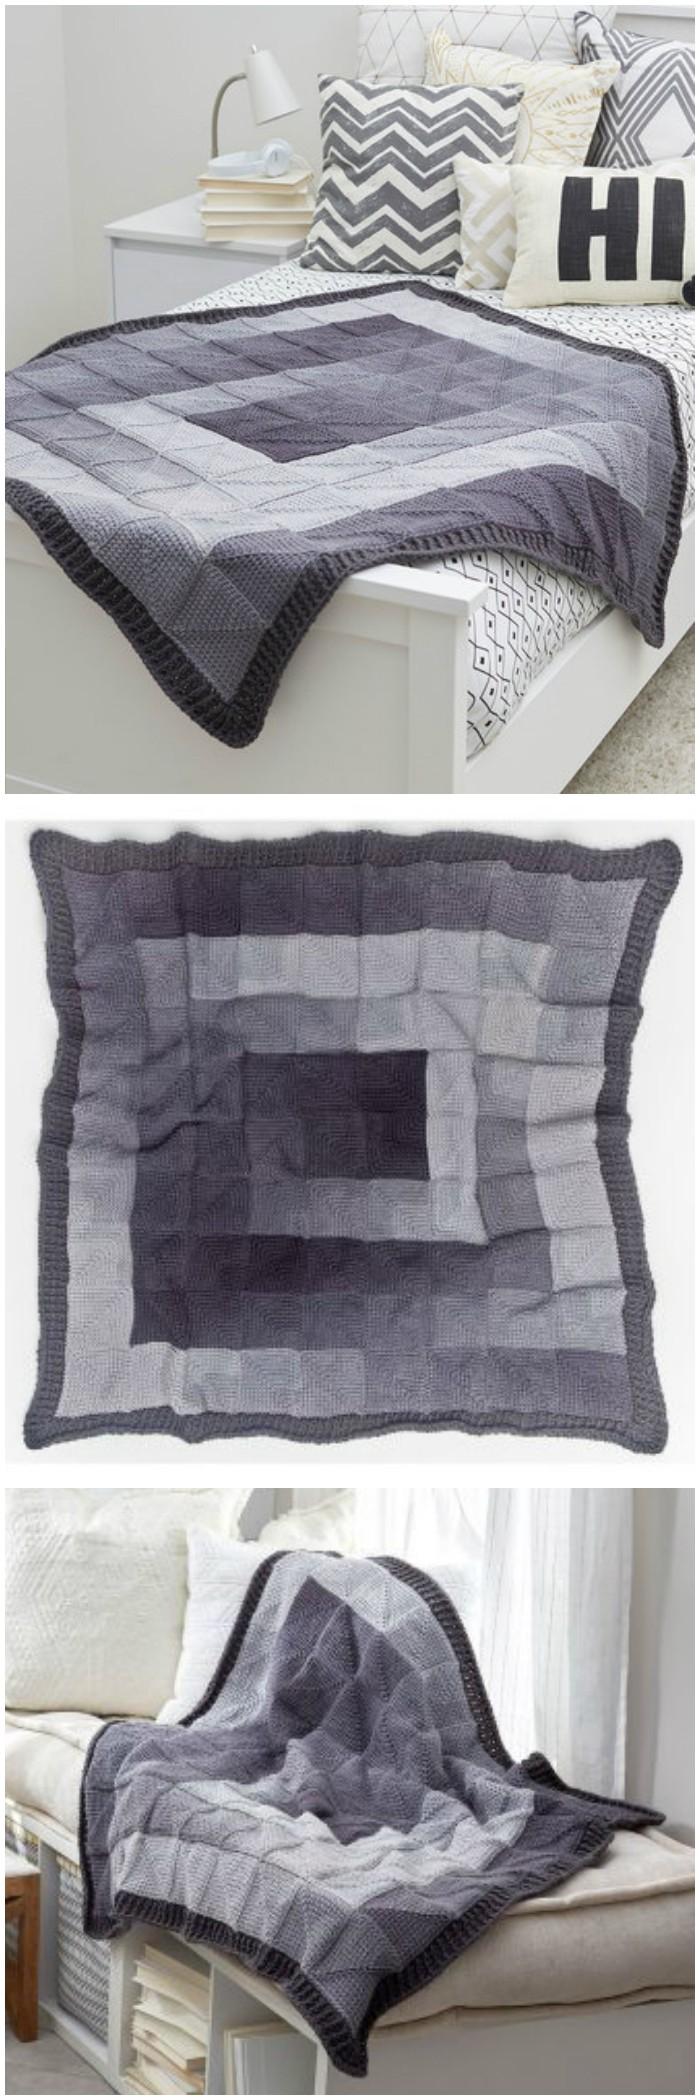 Modern Squares Throw Free Knitting Pattern - crochet blanket